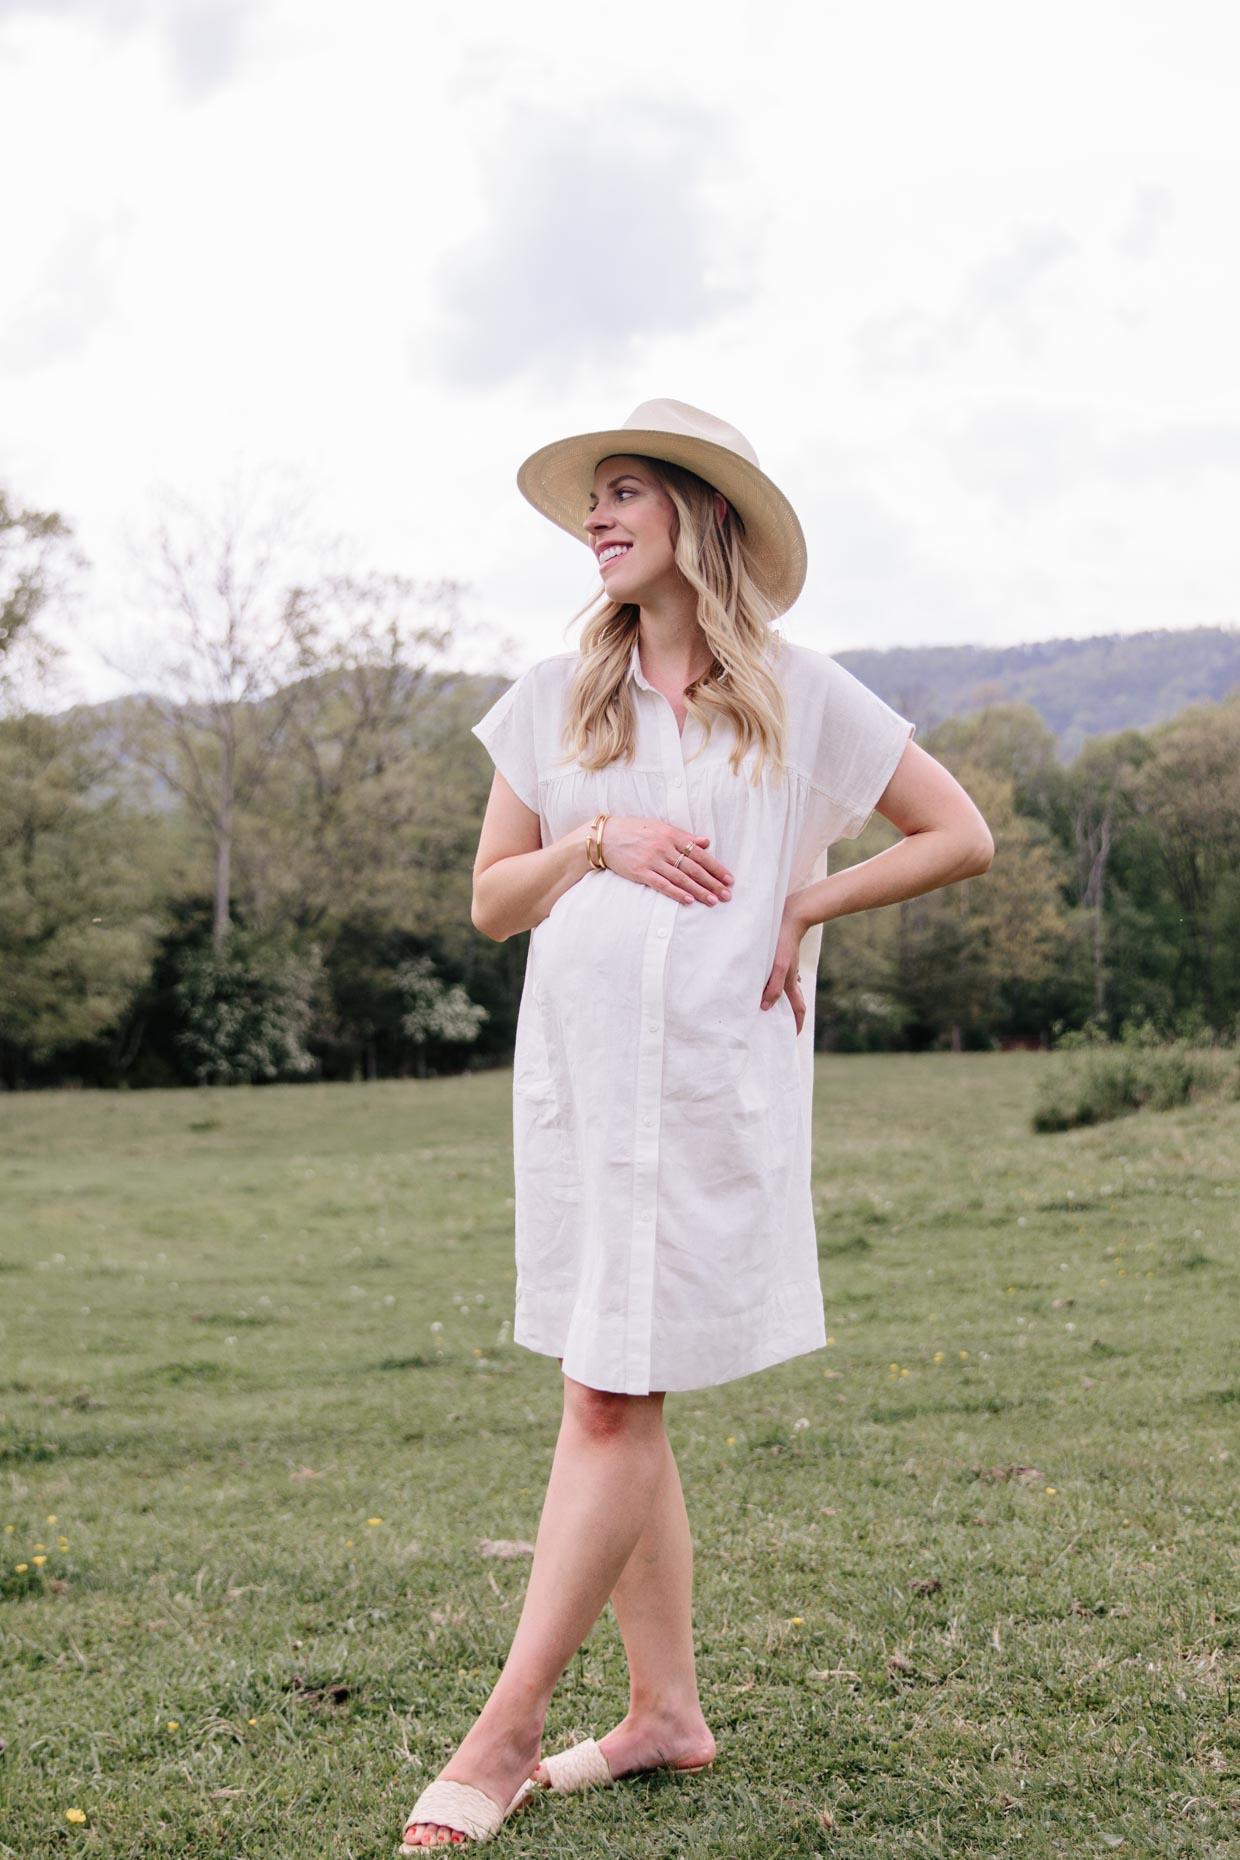 Meagan Brandon fashion blogger Meagan's Moda wears The Nines by Hatch maternity dress for Target